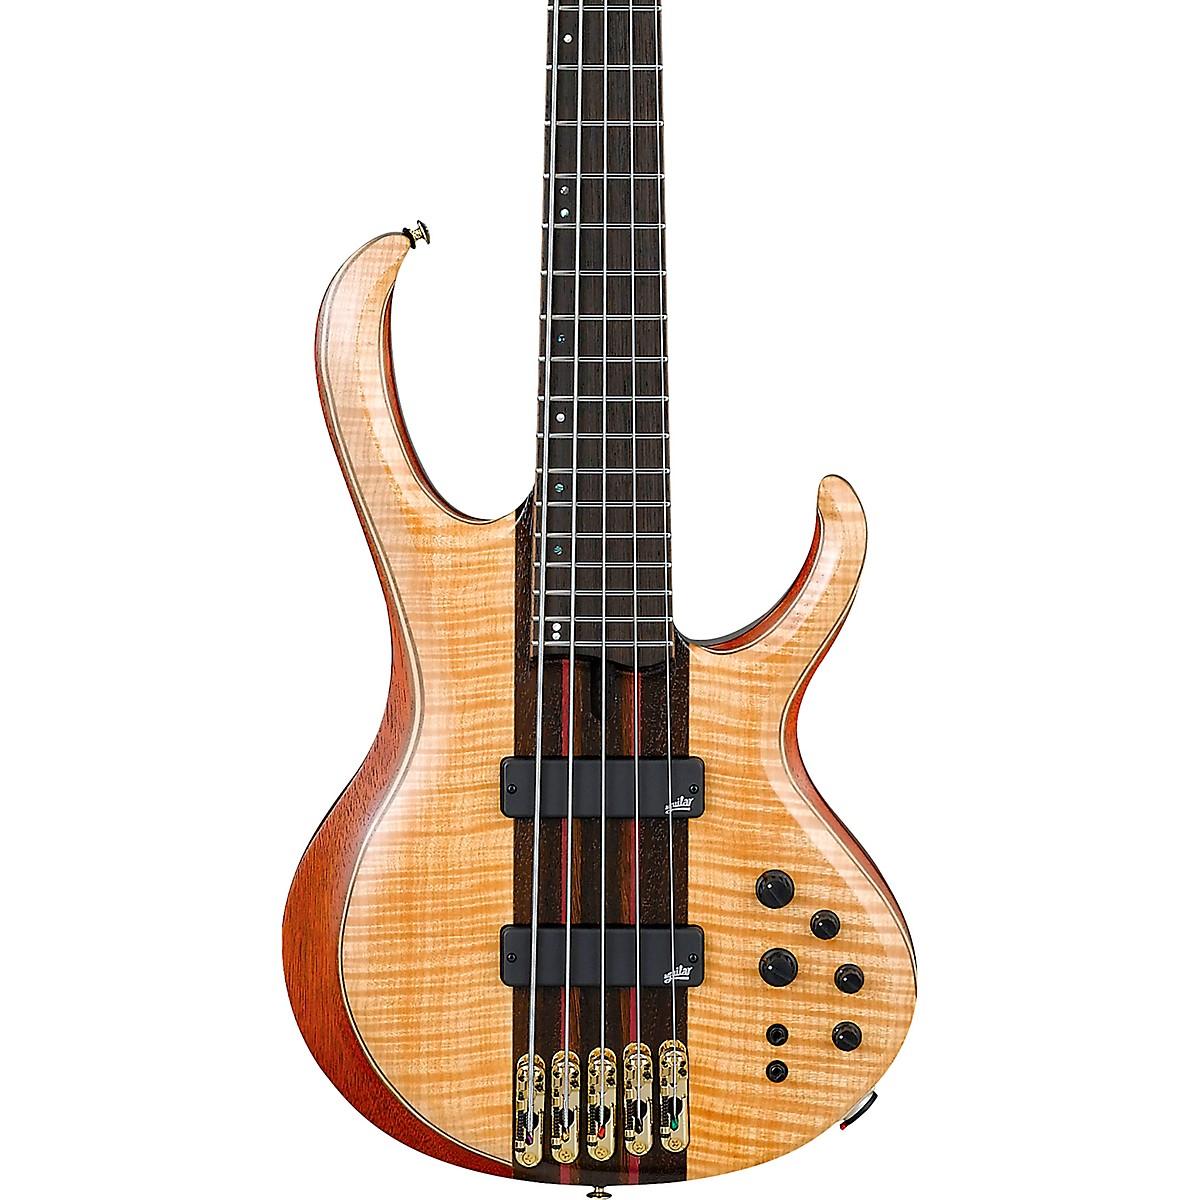 Ibanez BTB1905 Premium 5-String Bass Guitar